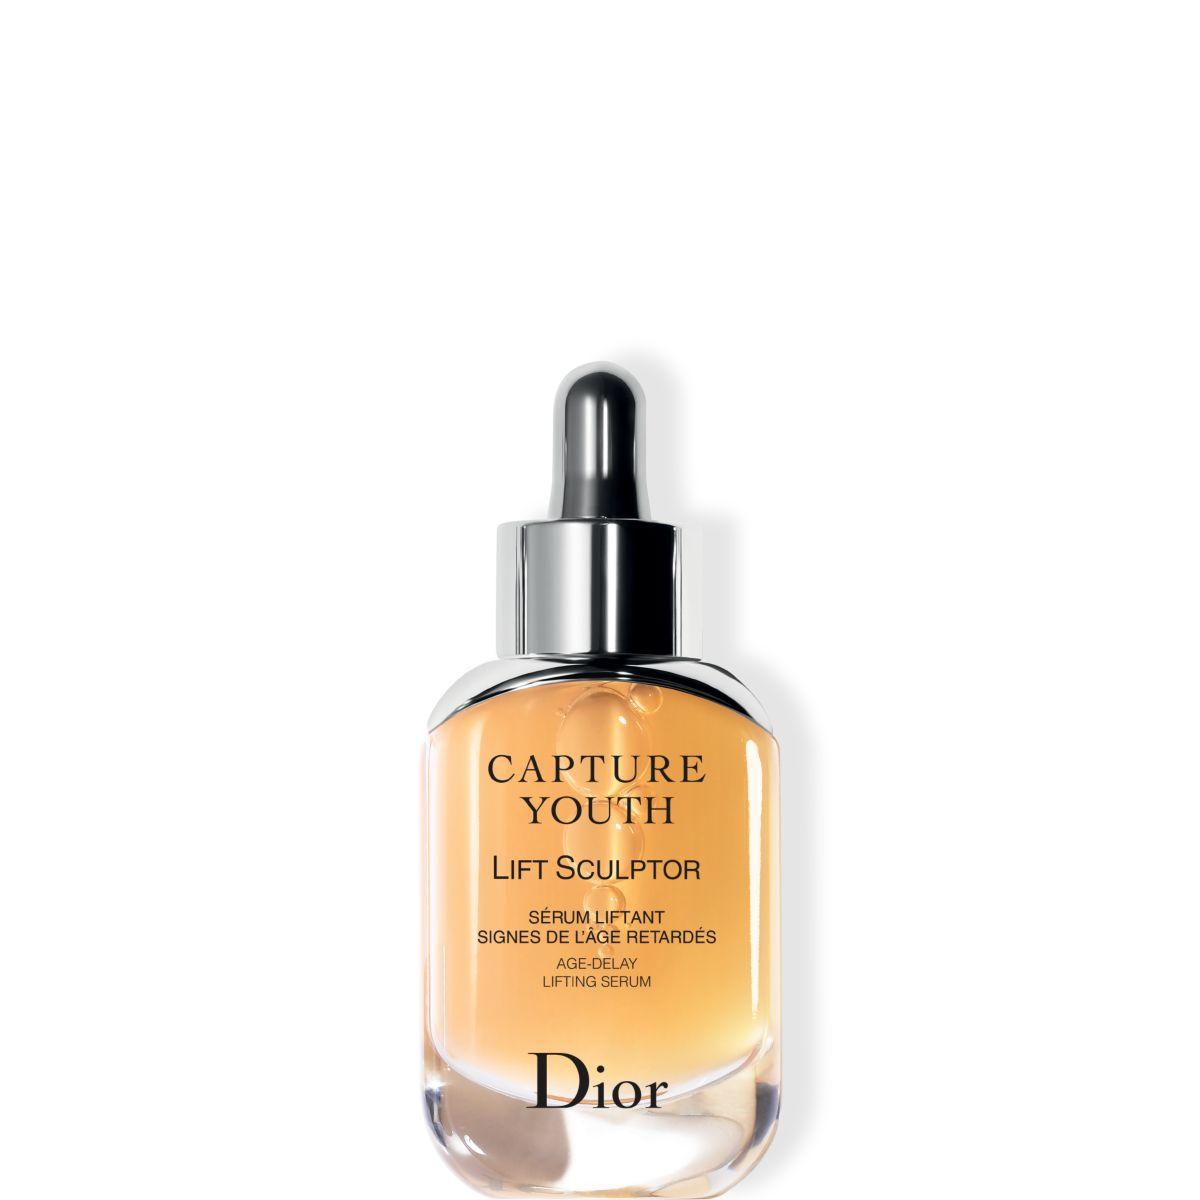 Dior - Capture Youth - Lift Sculptor Sérum liftant